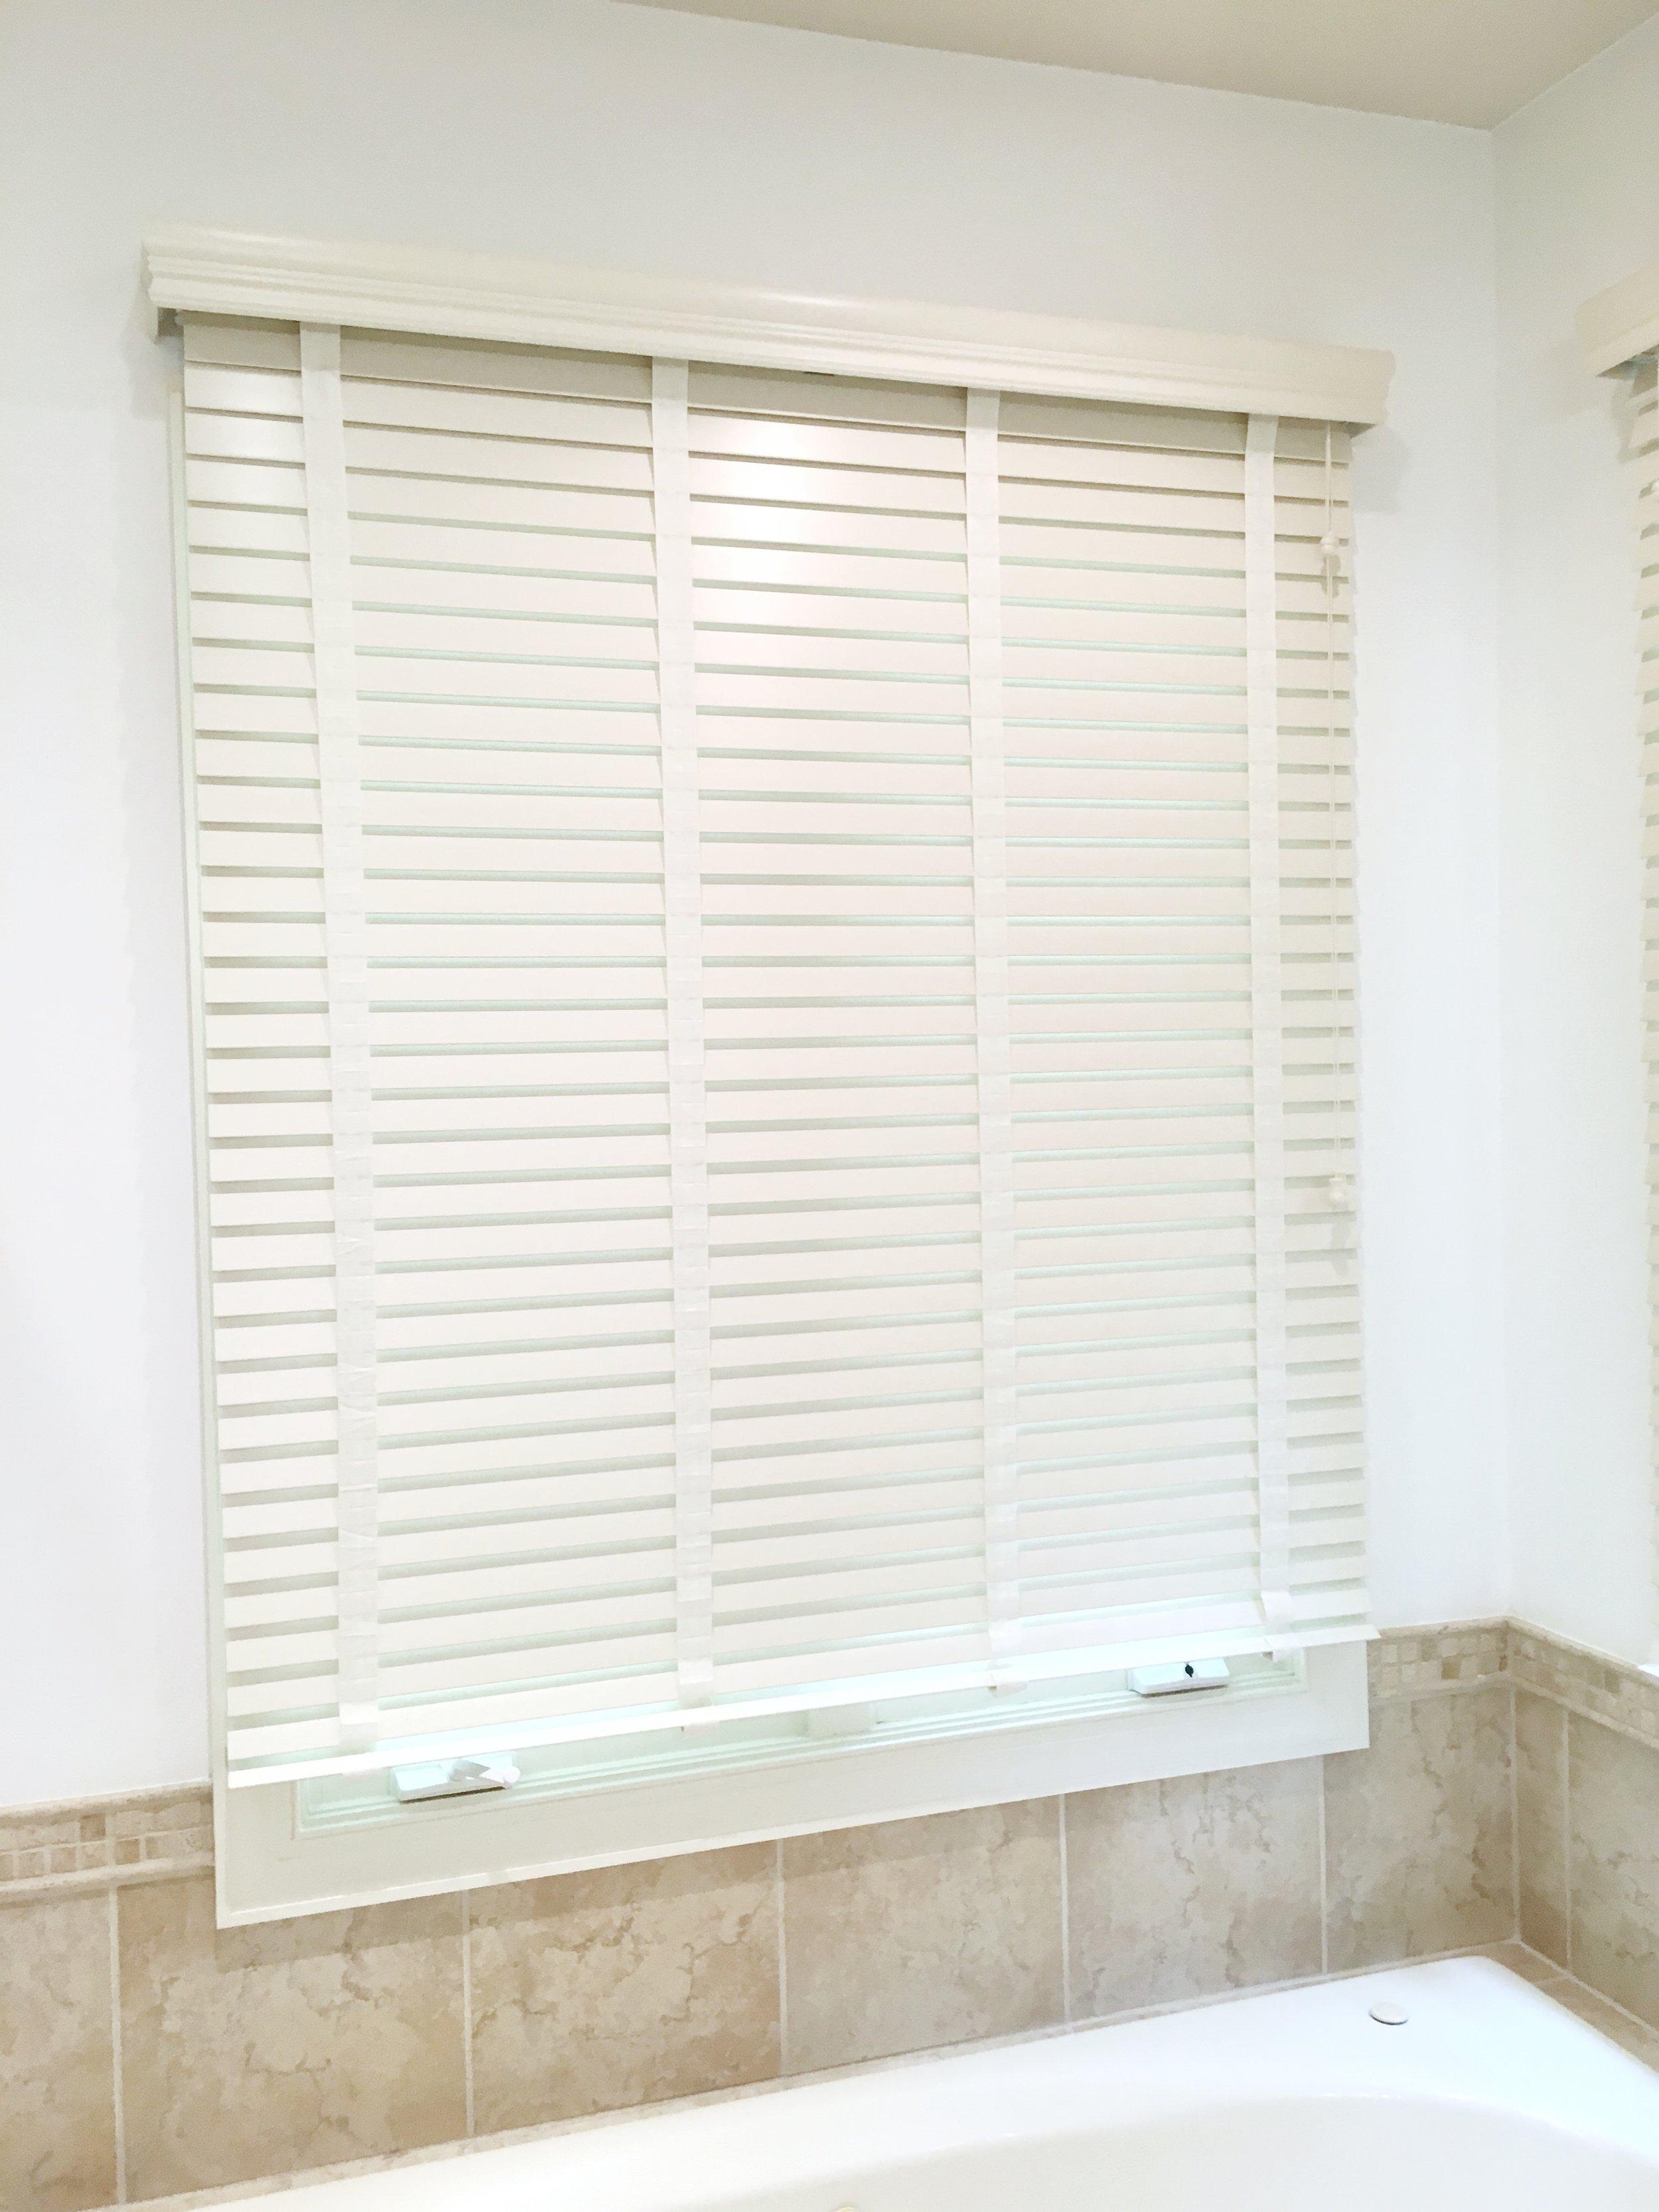 3rdGenBlinds custom window blinds in master bathroom